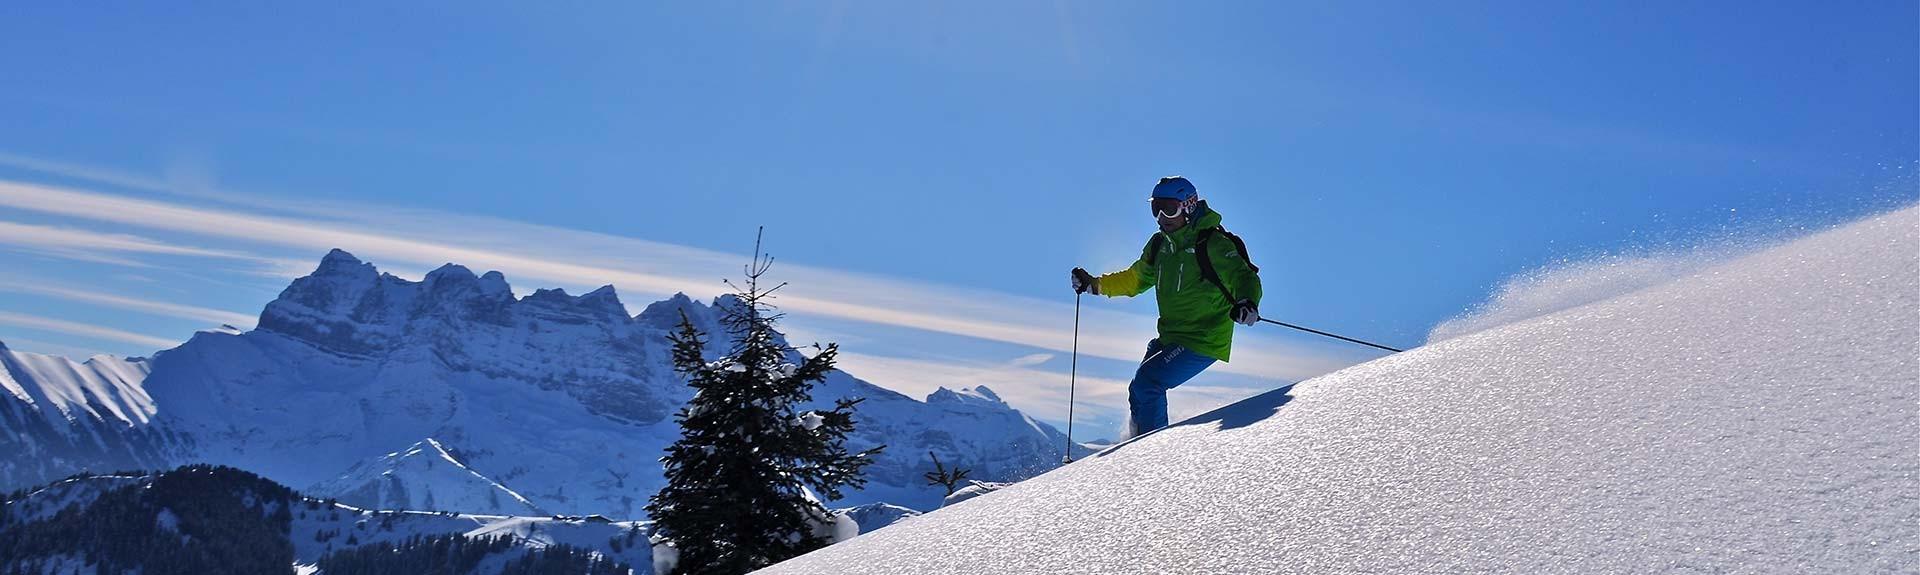 Skipistes & sneeuw info